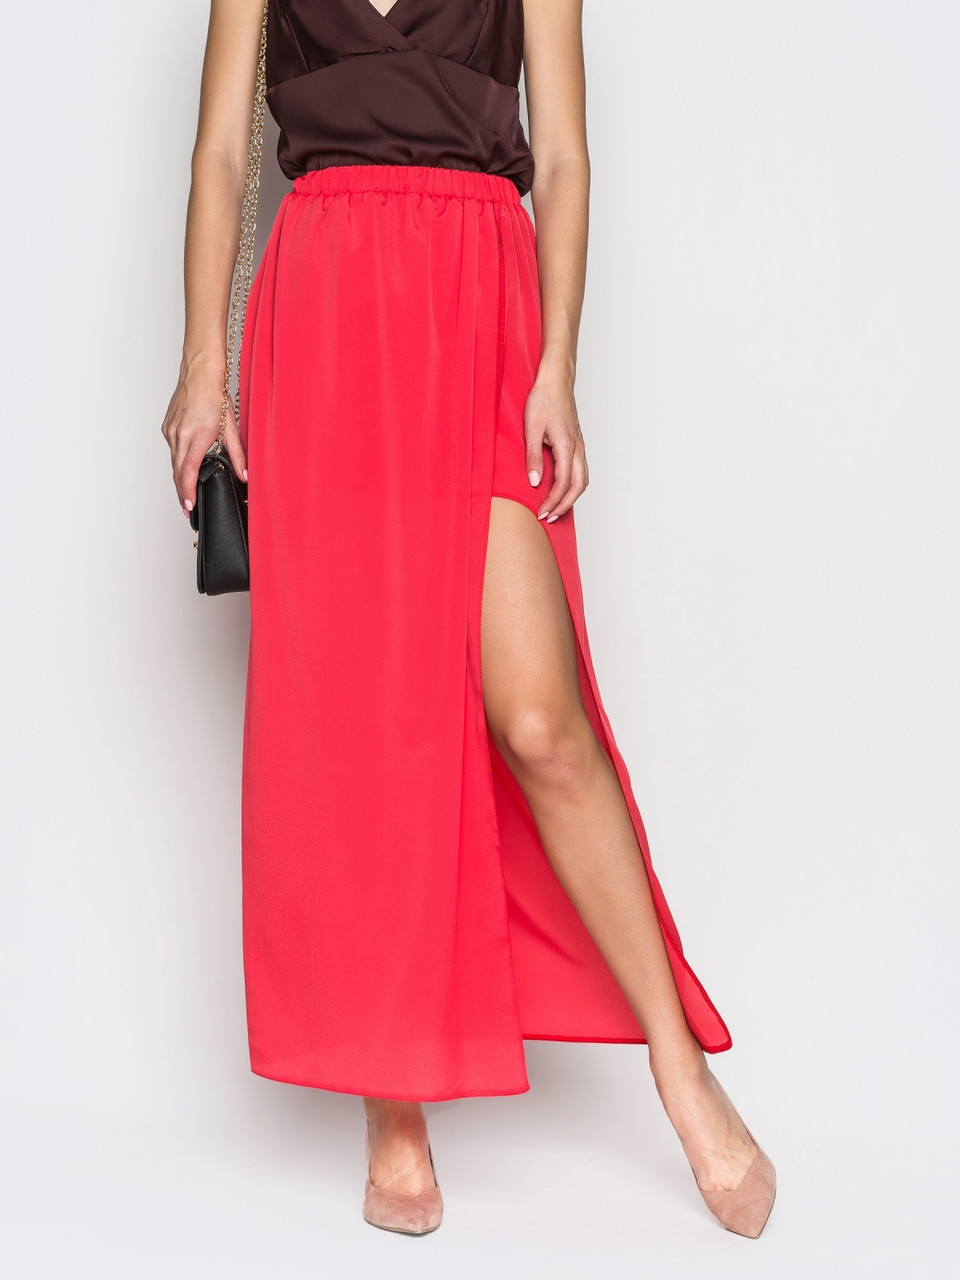 28d2135e504 👶Яркая юбка макси на запах с поясом-резинкой (красная)   Размер 44 ...